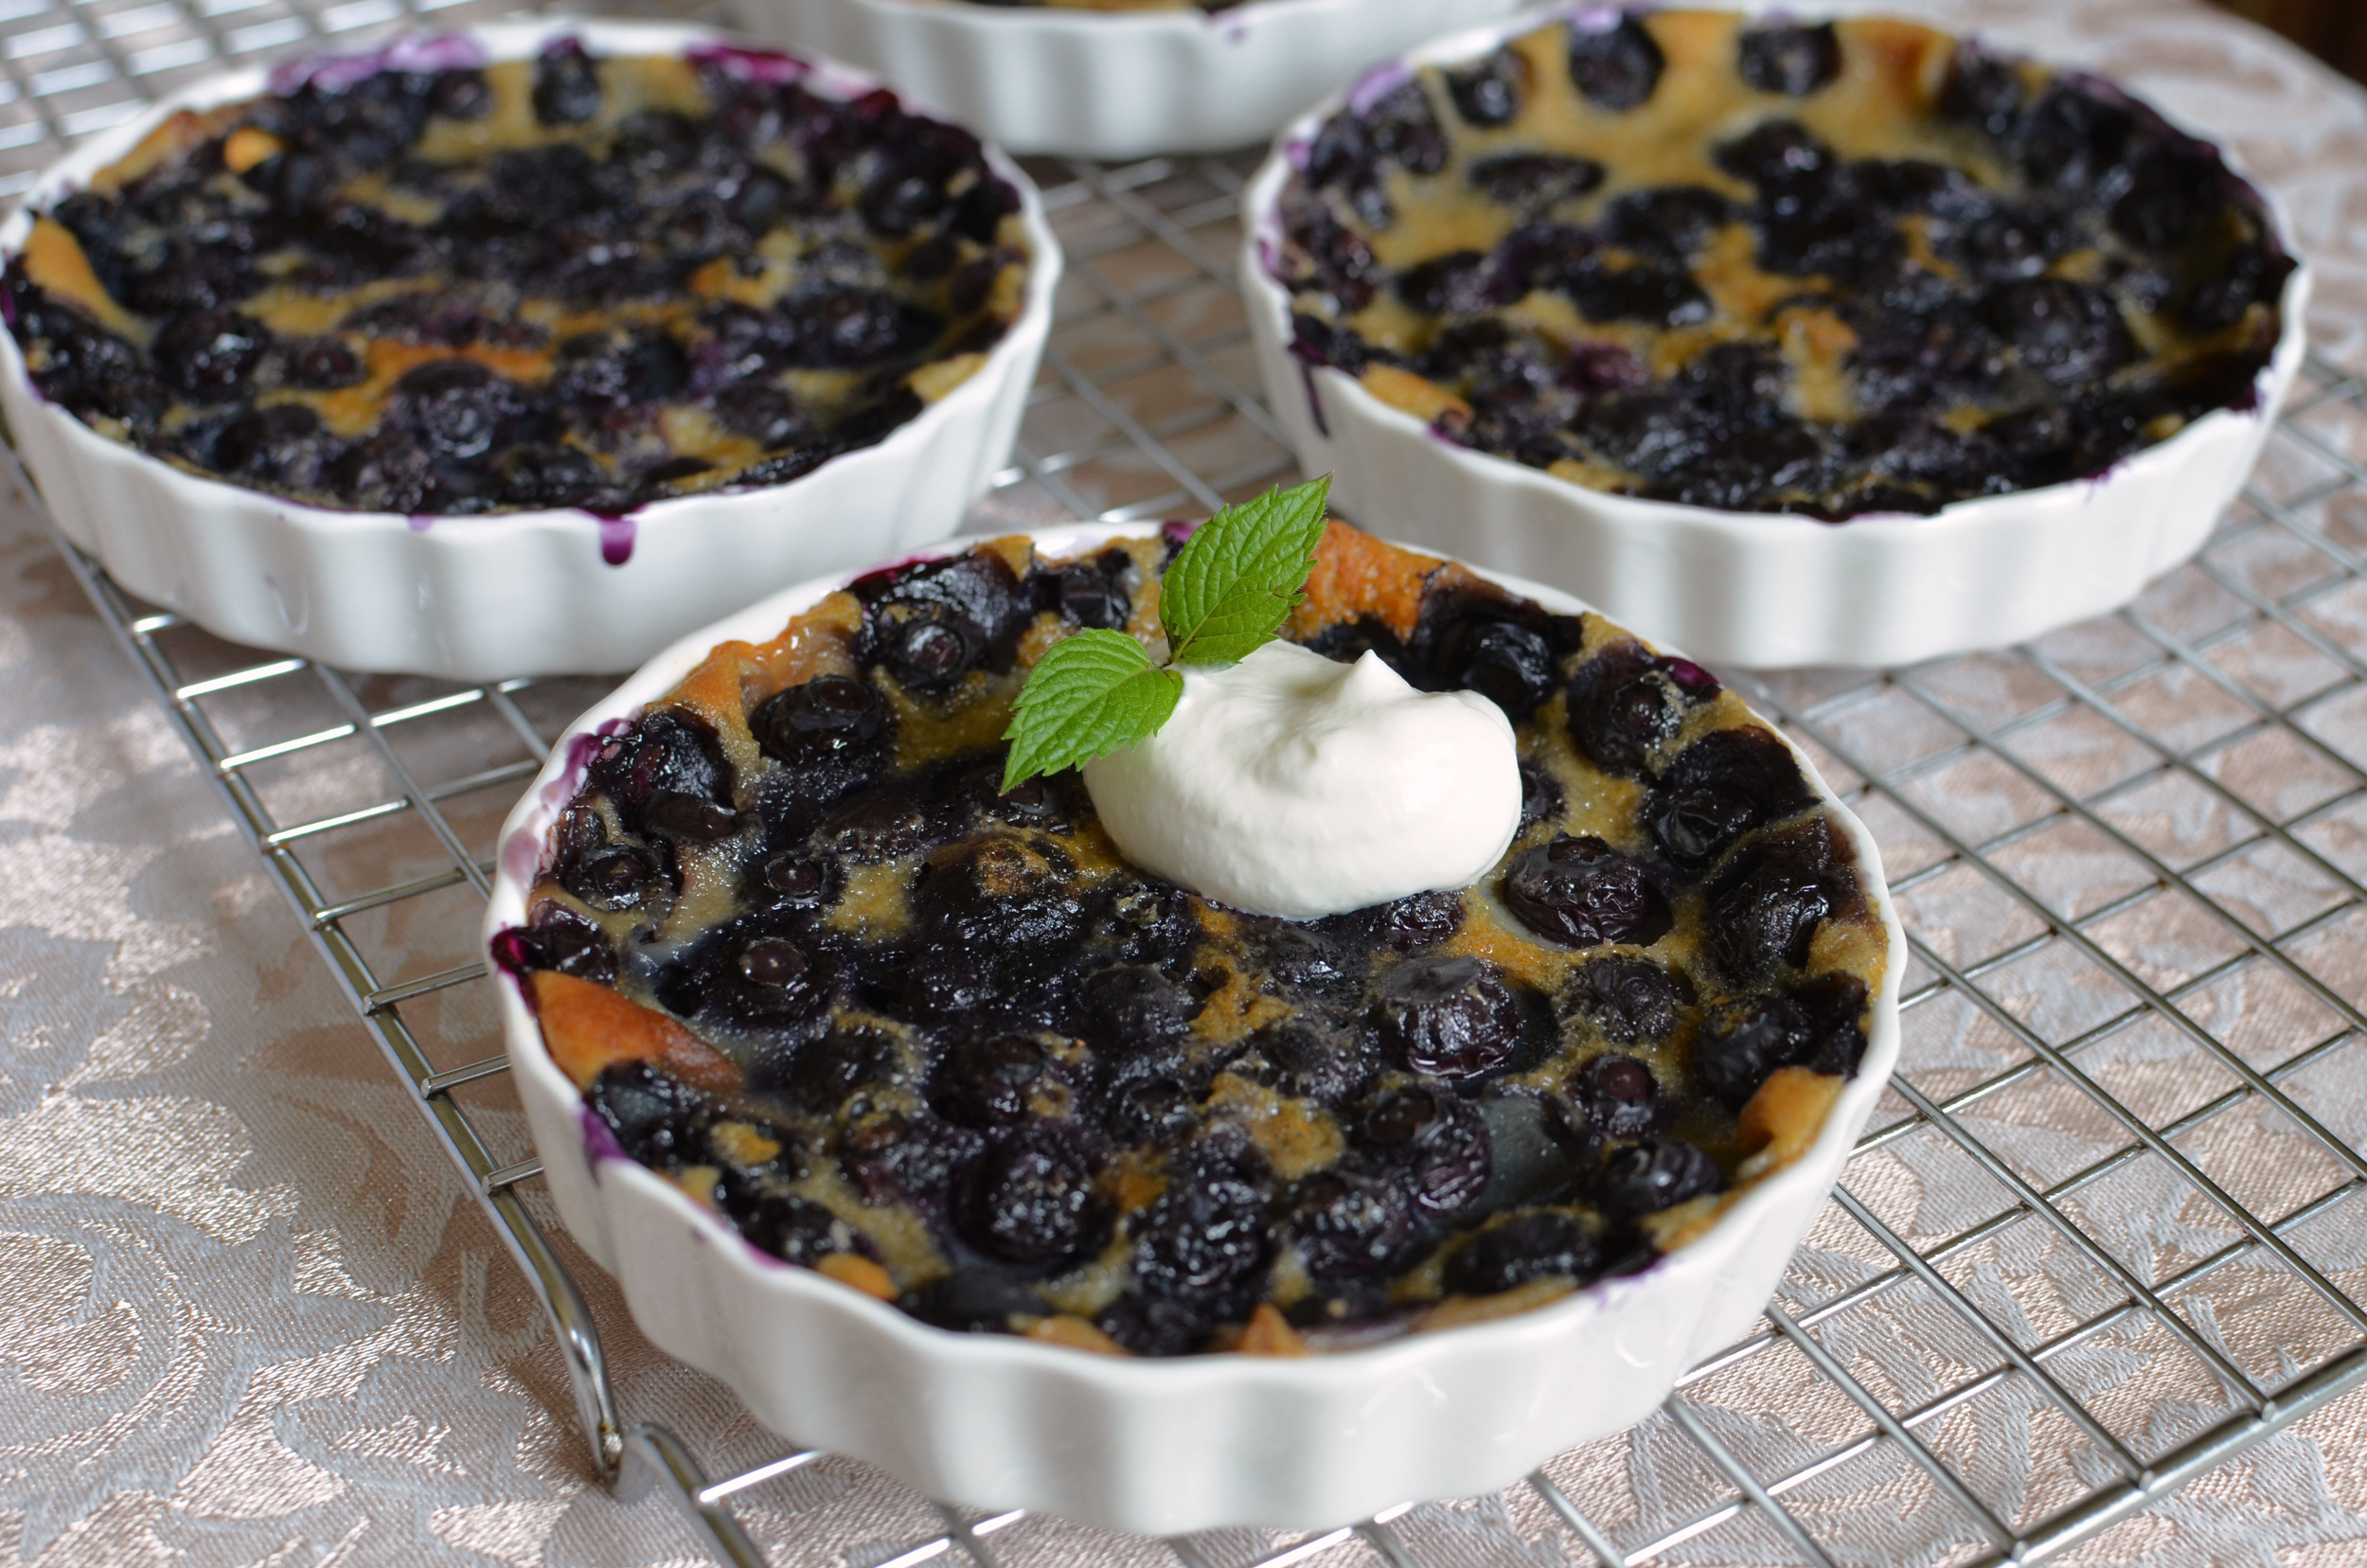 Mini Blueberry Clafoutis - ButterYum. individual clafoutis recipe. how to make clafoutis. French dessert. French custard dessert recipe. How to make clafoutis. can I any fruit to make clafoutis? clafoutis recipe. simple clafoutis recipe.